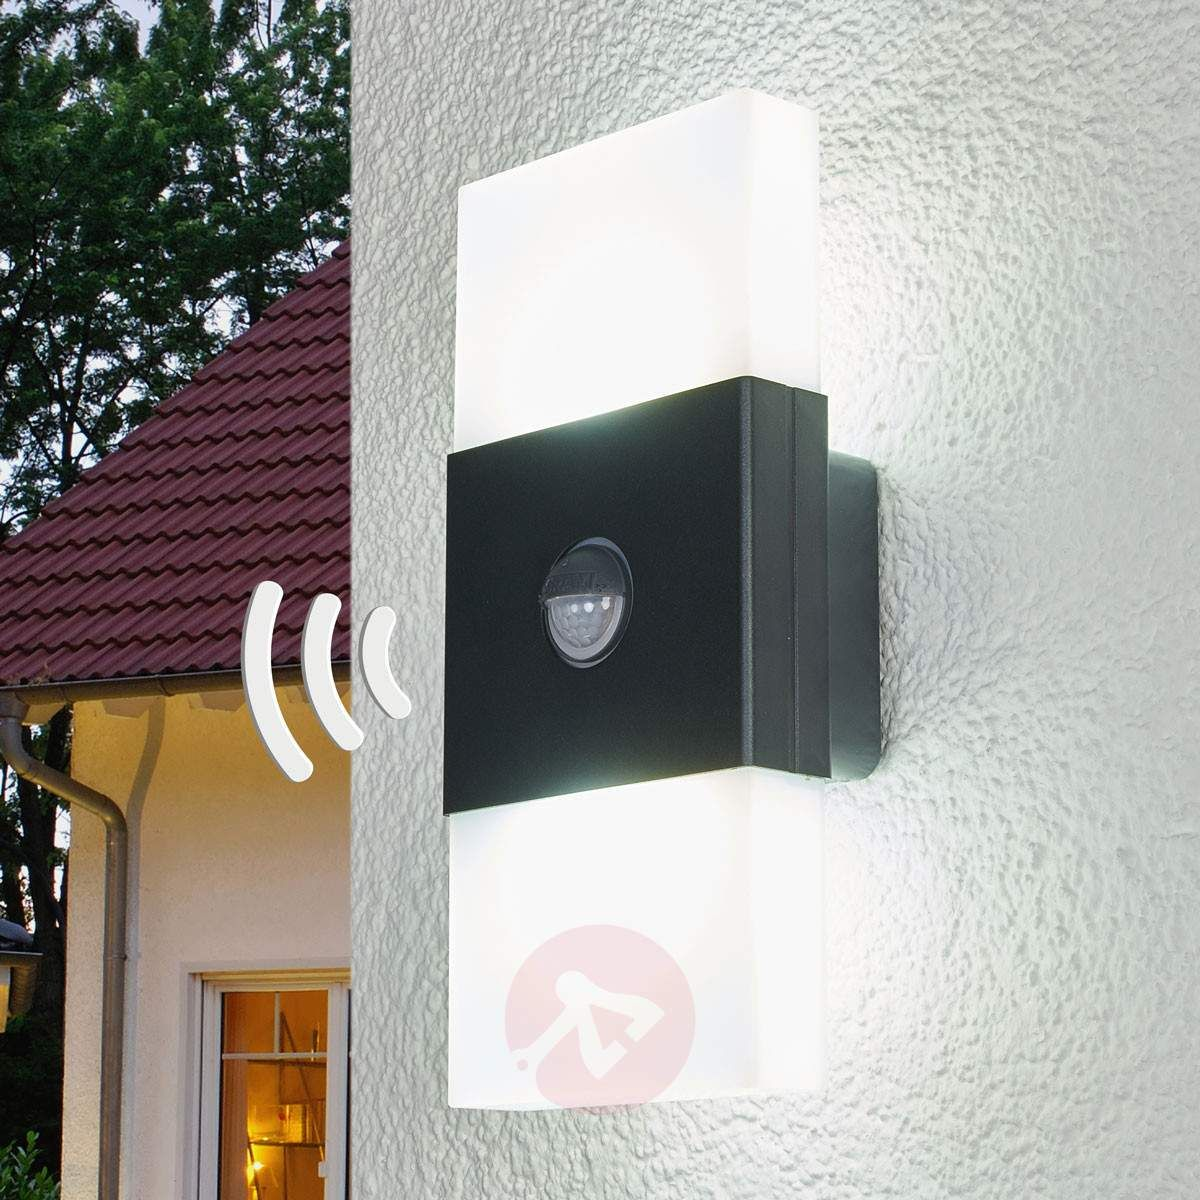 Modern outdoor wall lamp Noxlight LED Wall Doub gr-7261090-31 | home ...